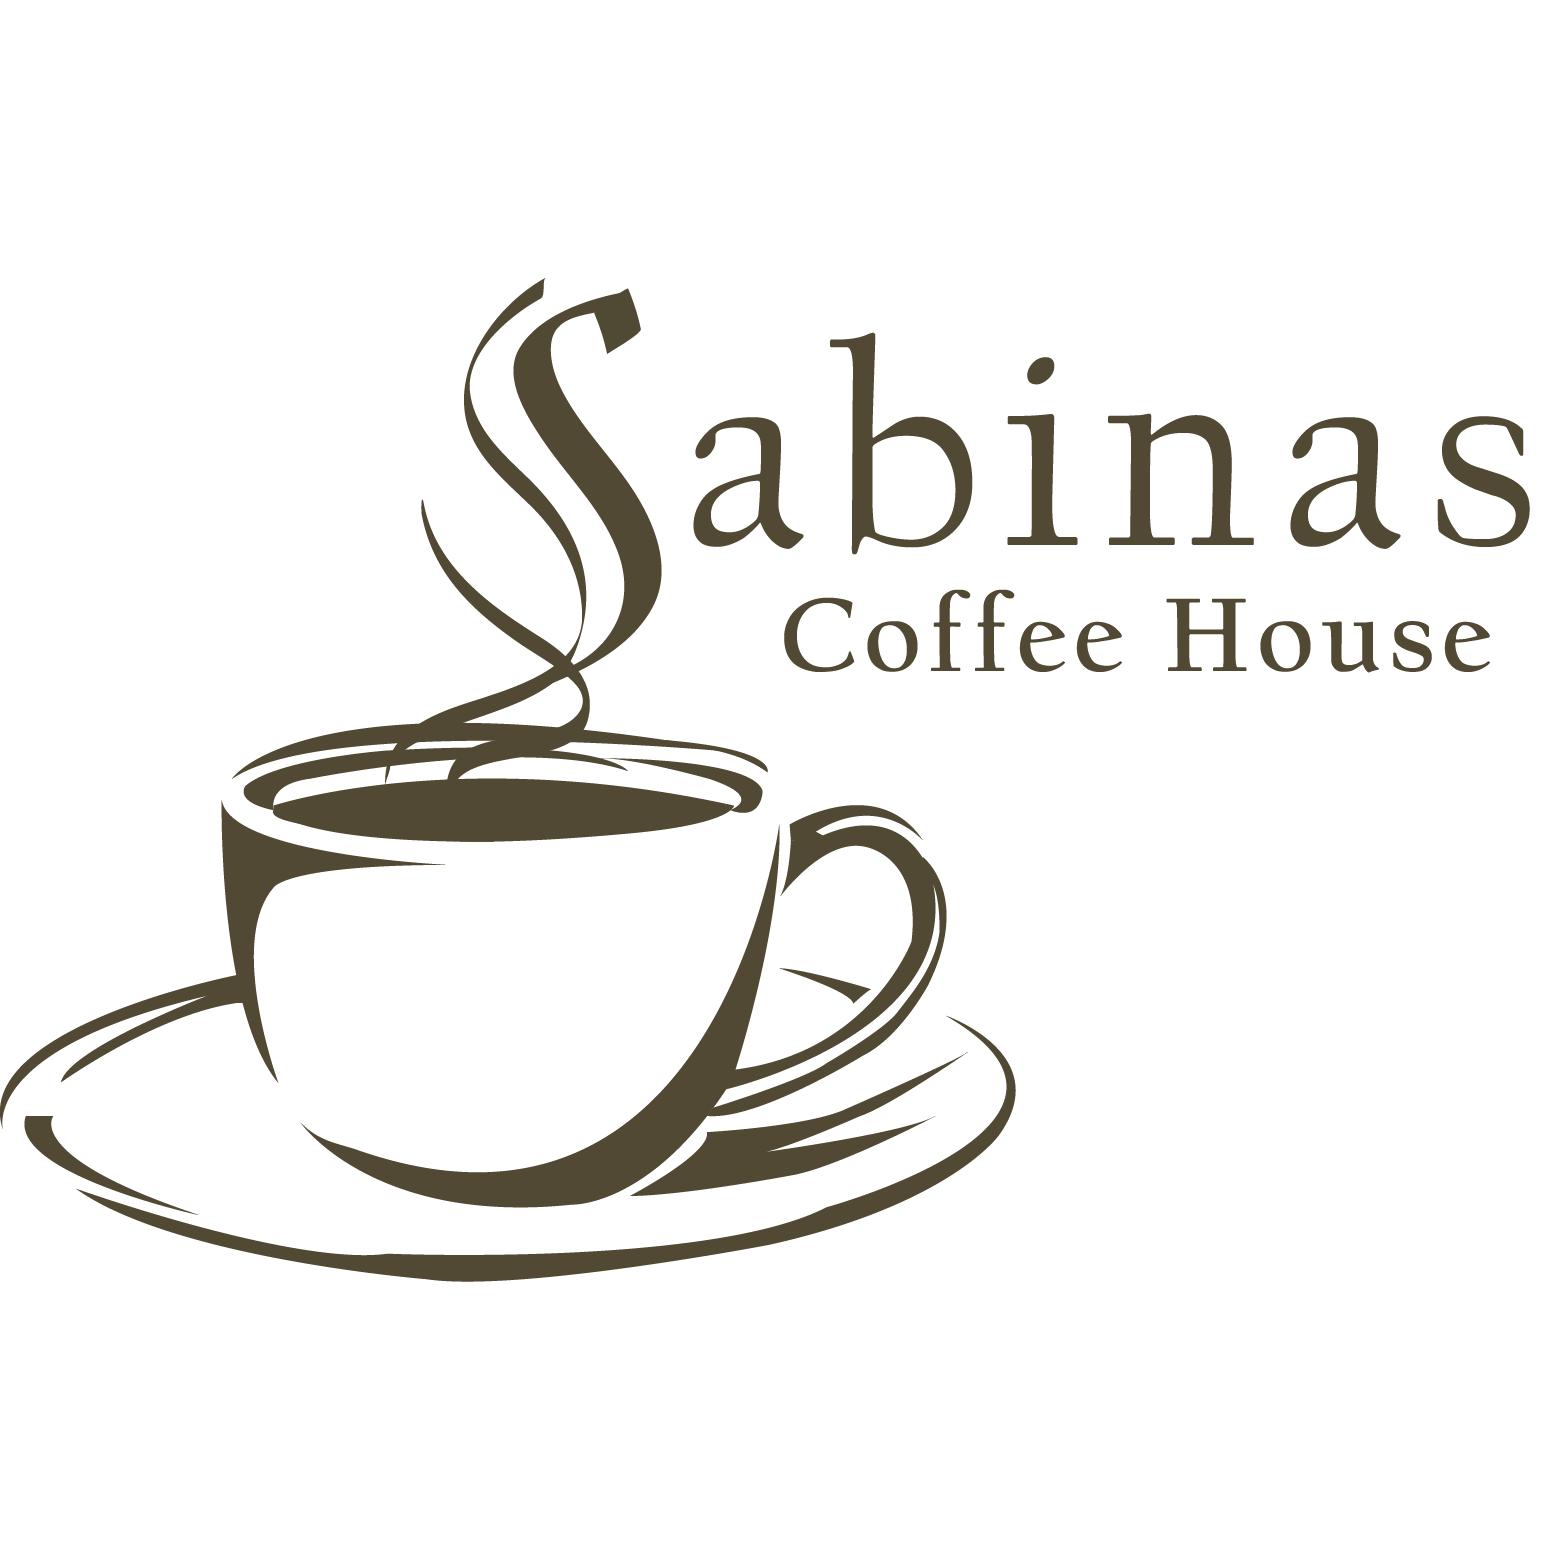 Sabinas Coffee House